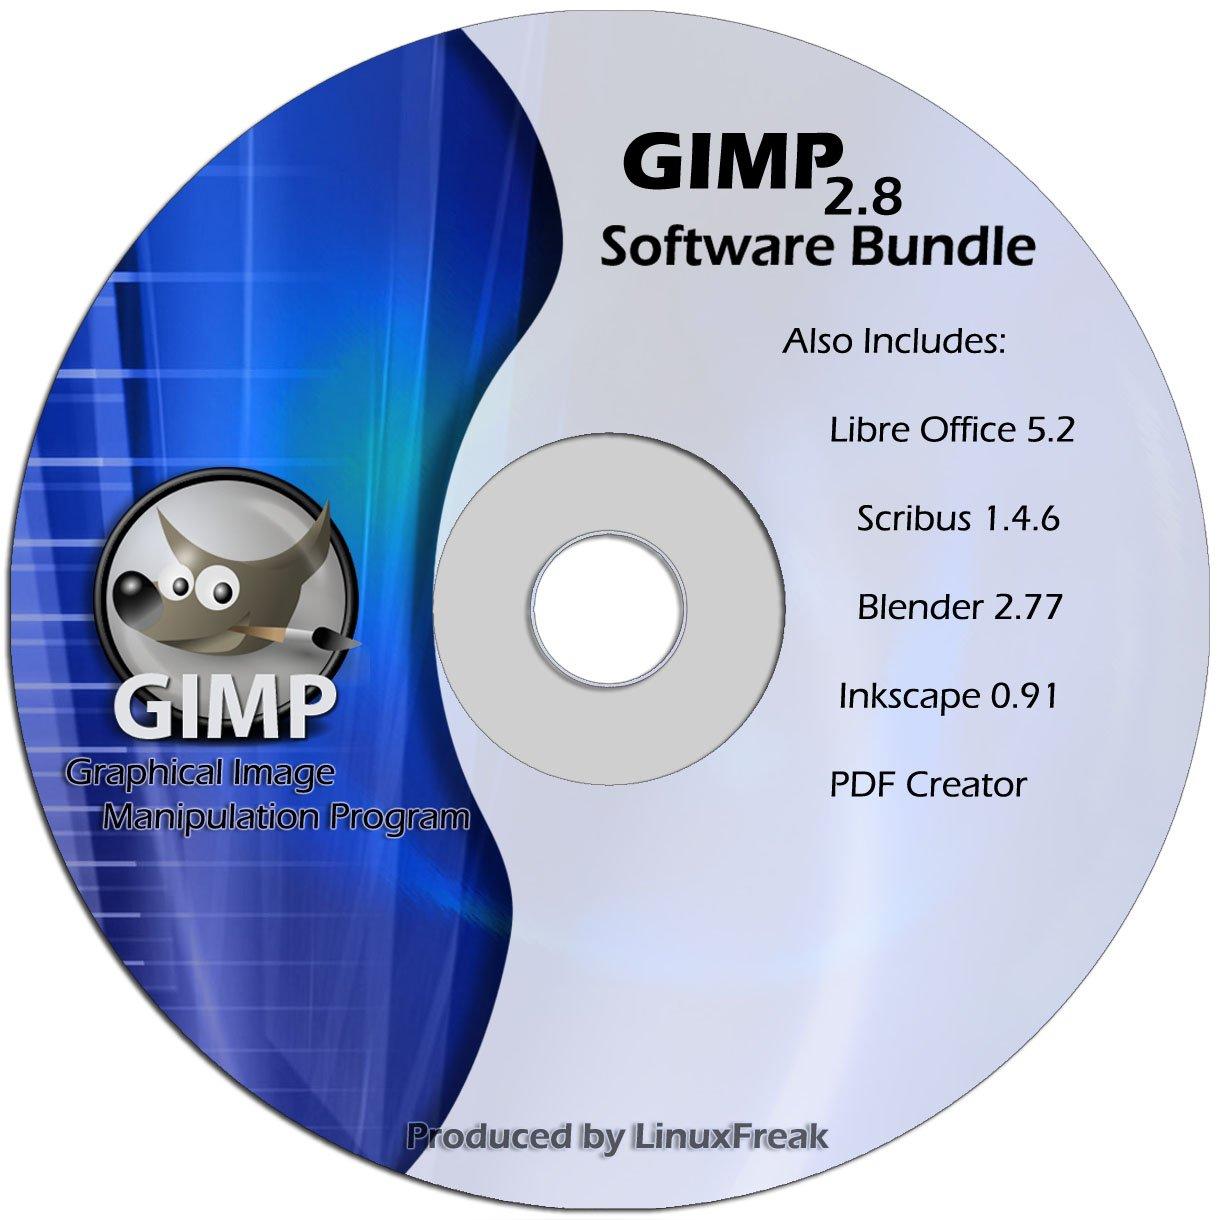 Game boy color palette gimp - Amazon Com Gimp 2 8 Photo Editing Software Alternative To Photoshop